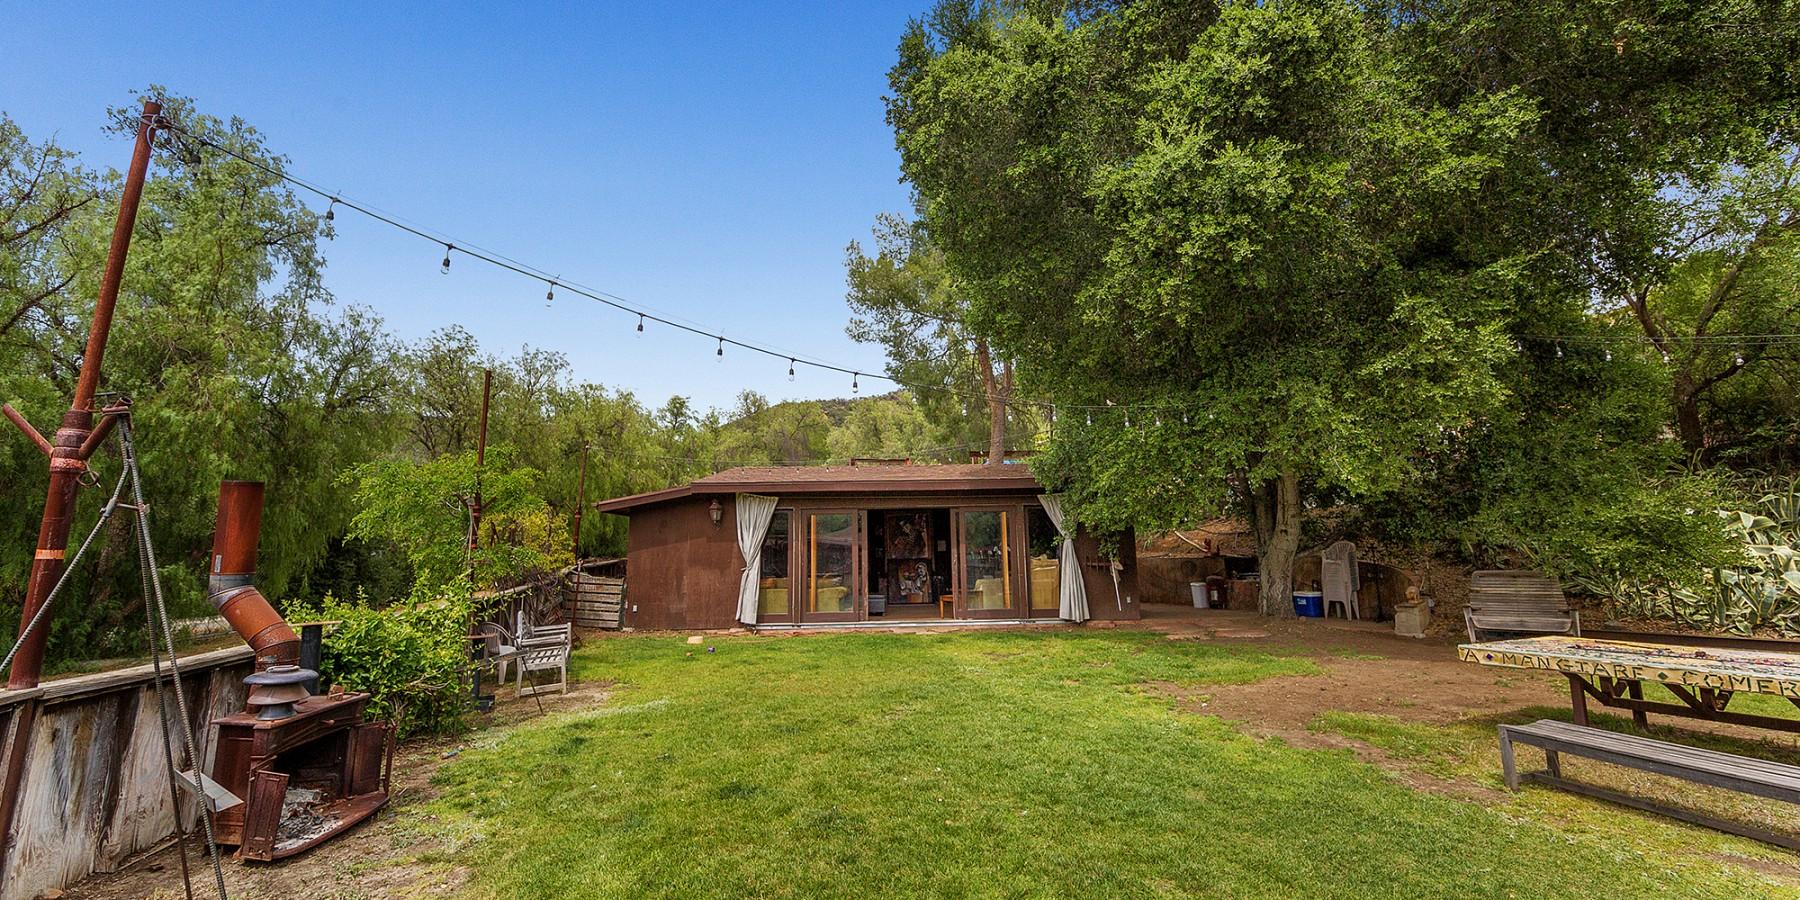 29995 Mulholland Highway, Agoura, CA 91301